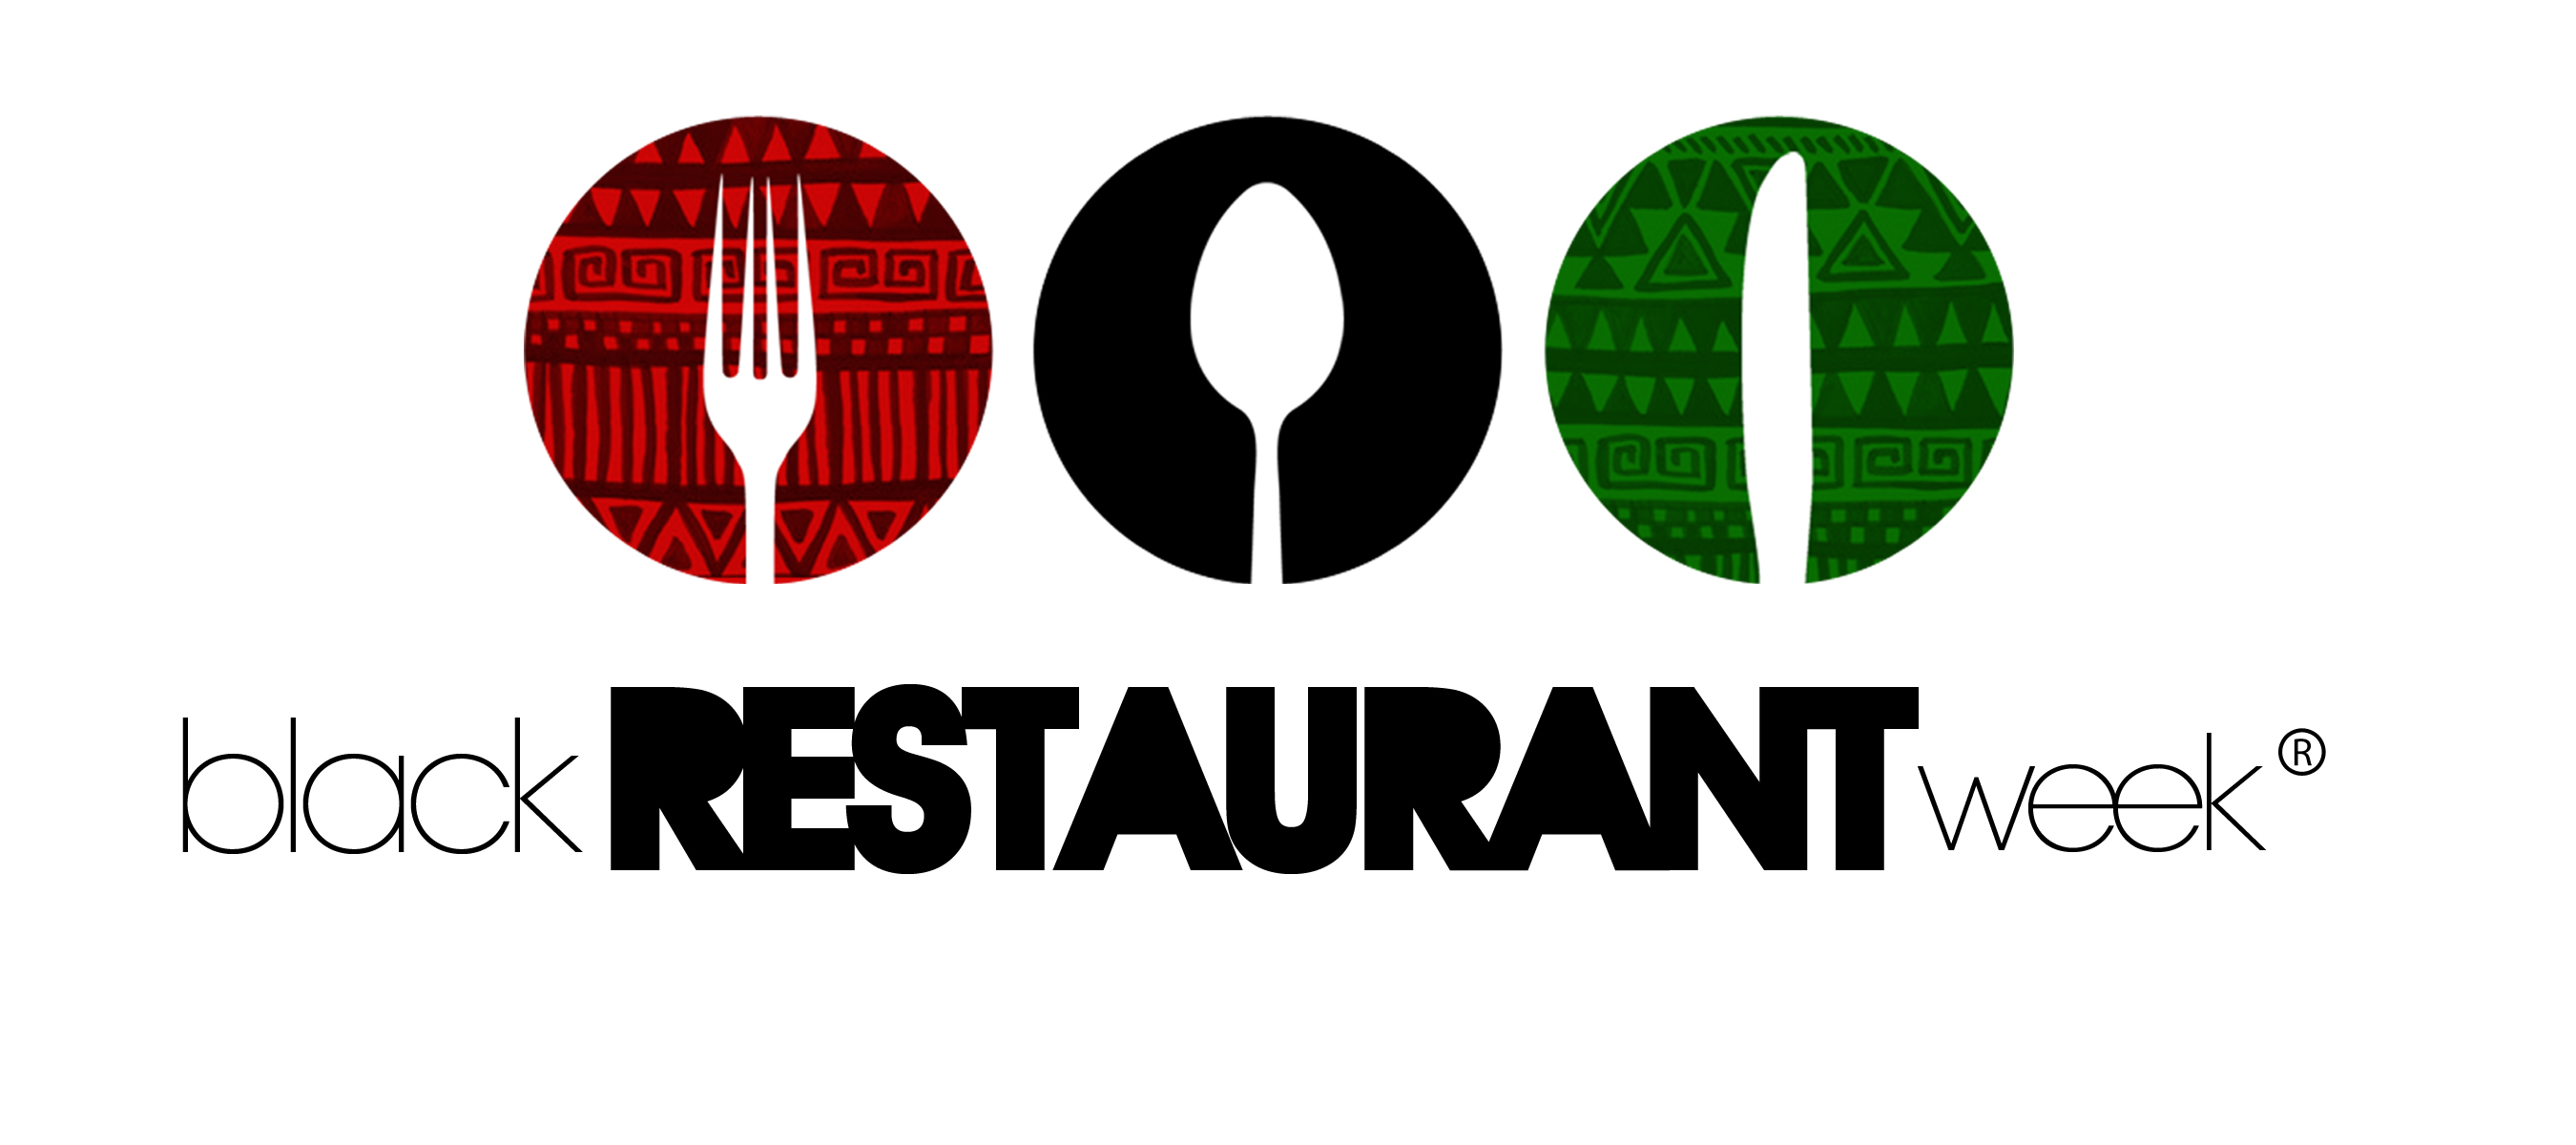 Black Restaurant Week Indy Indianapolis Food Blogger